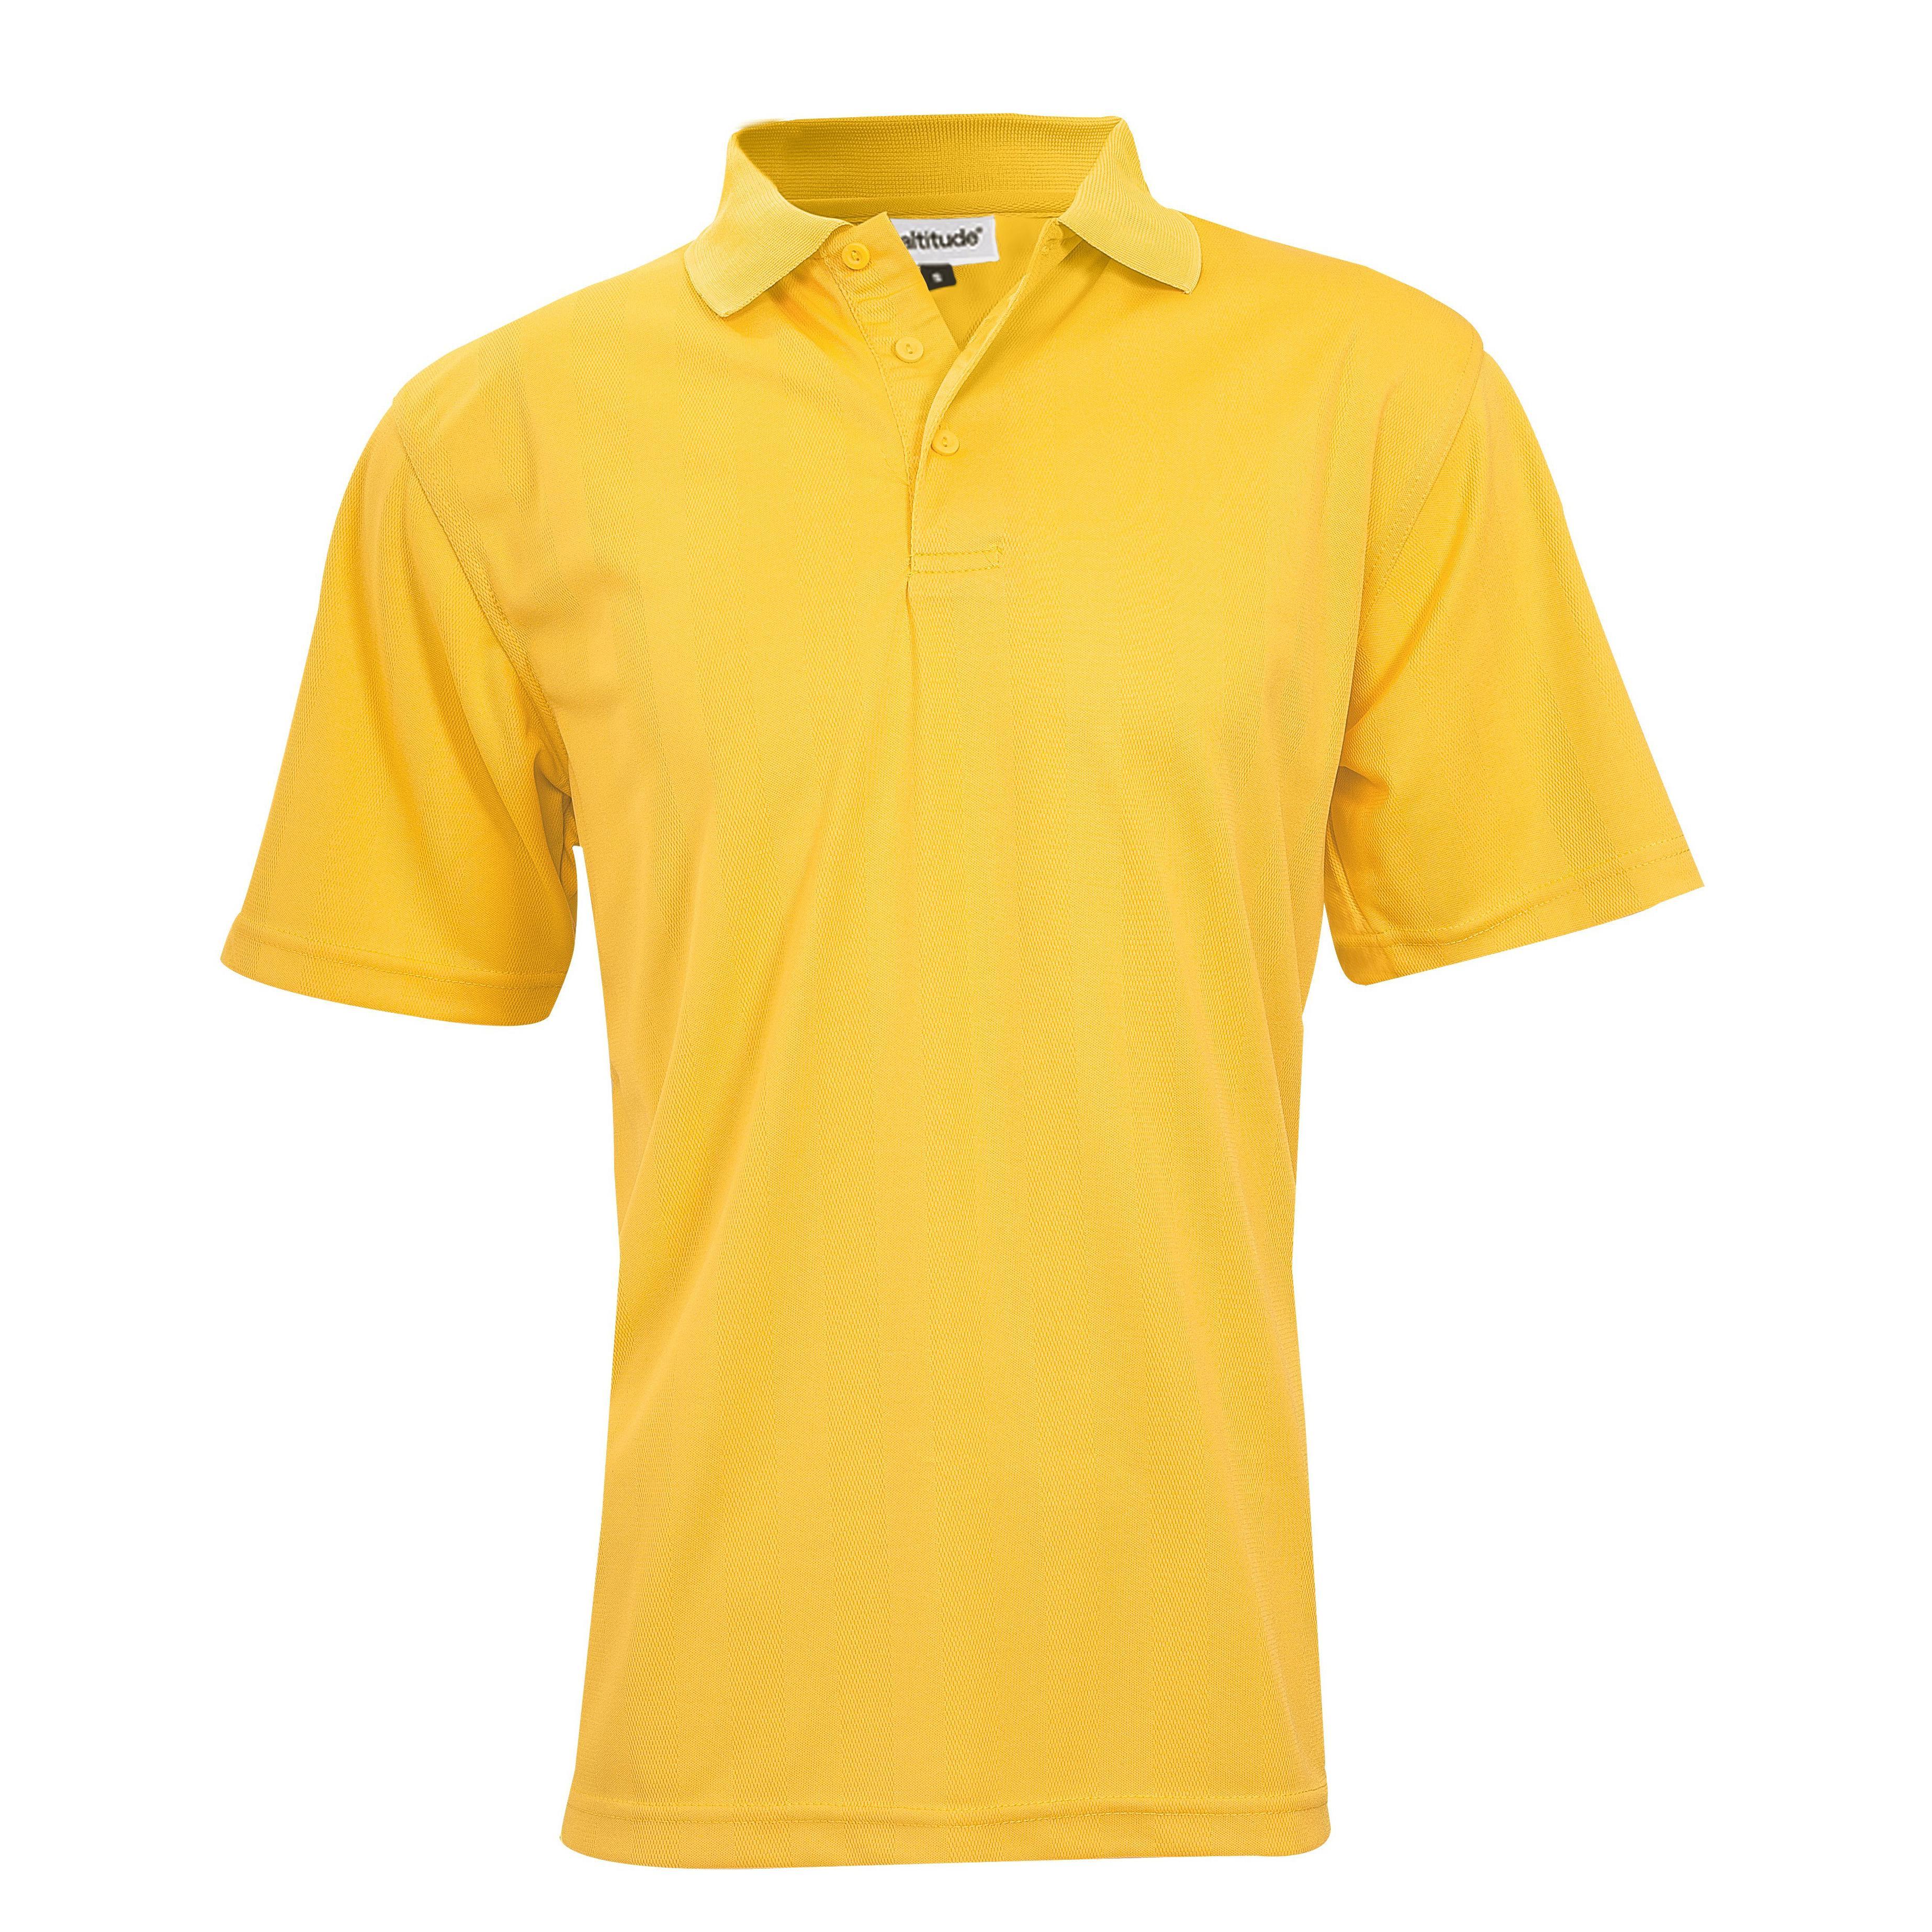 Mens Barcelona Golf Shirt - Yellow Only